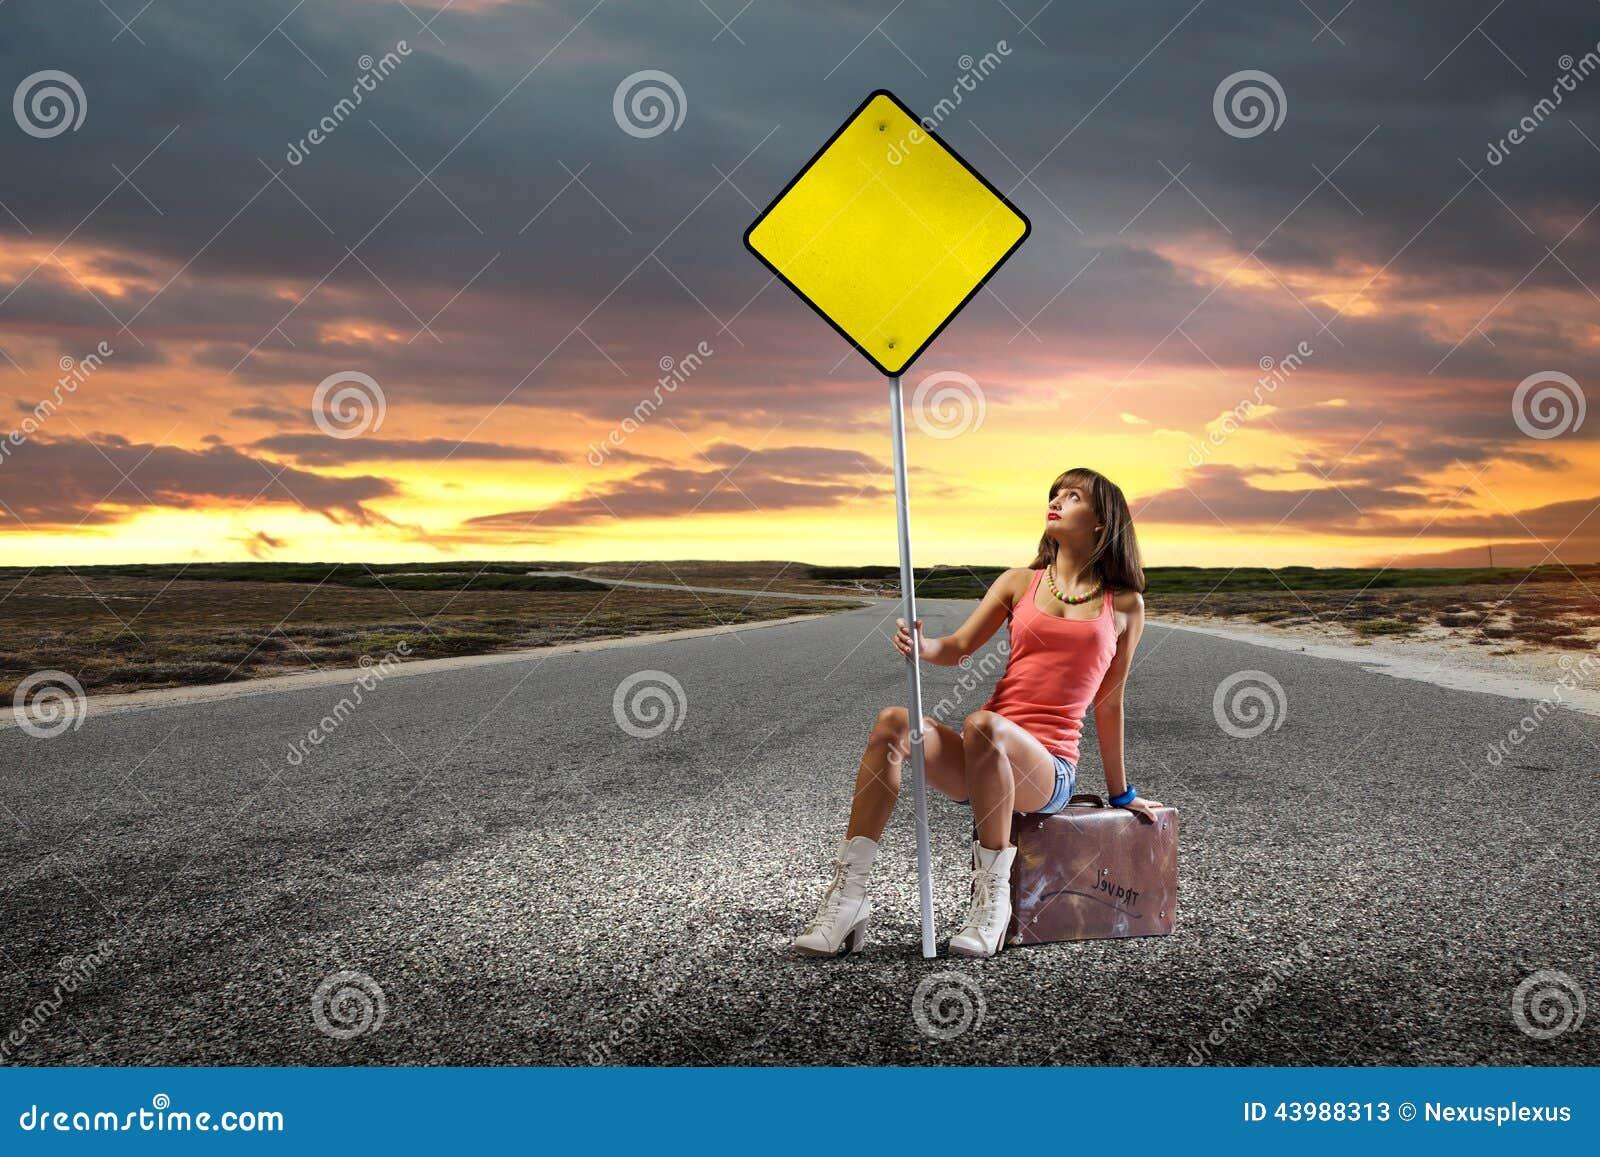 Autostop Time Travel